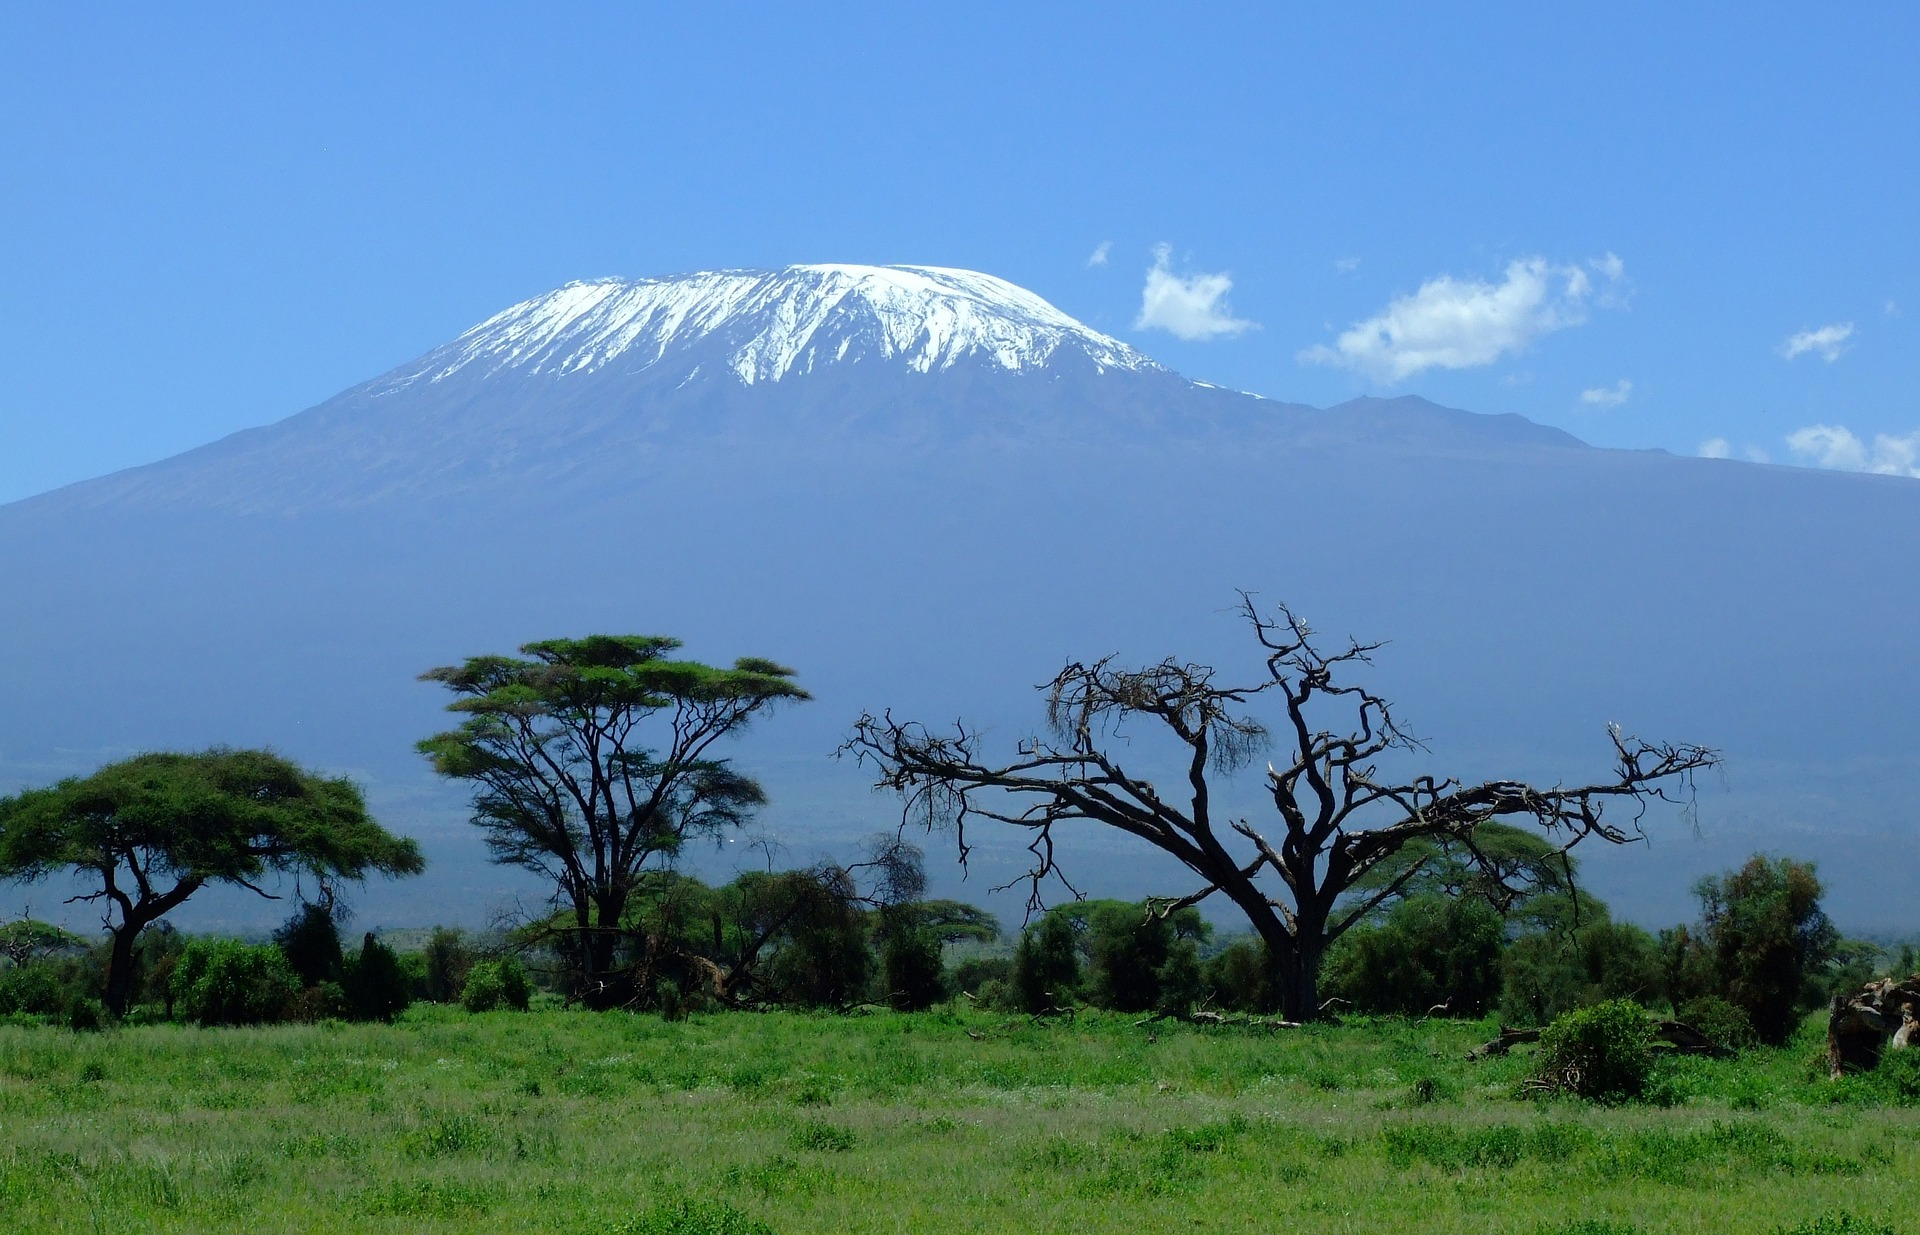 Mount Kilimanjaro dominates the skyline on this otherwise flat African plain.